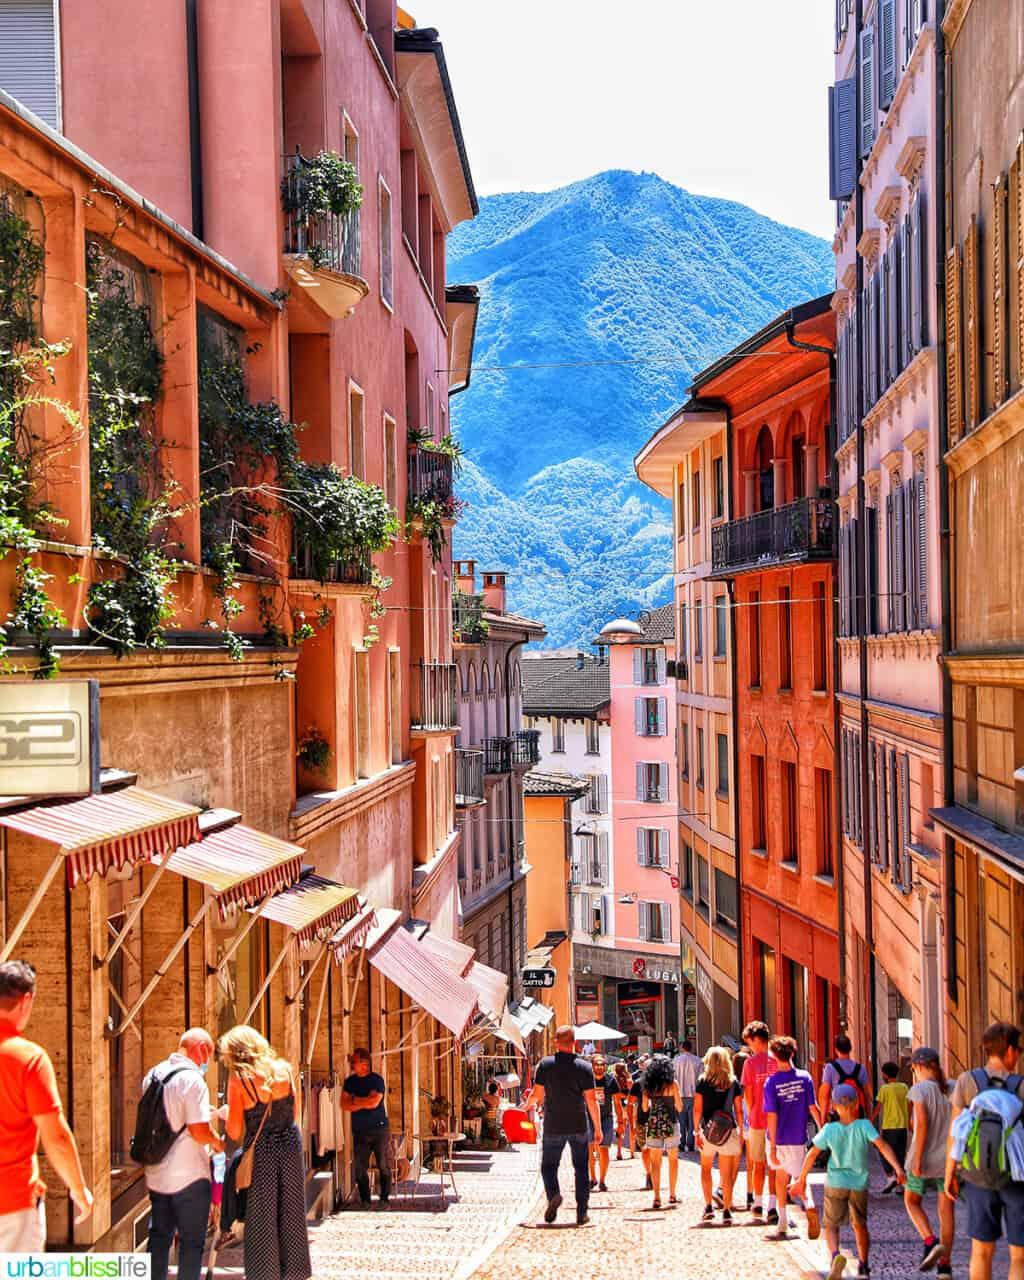 colorful steep street in Lugano, Switzerland